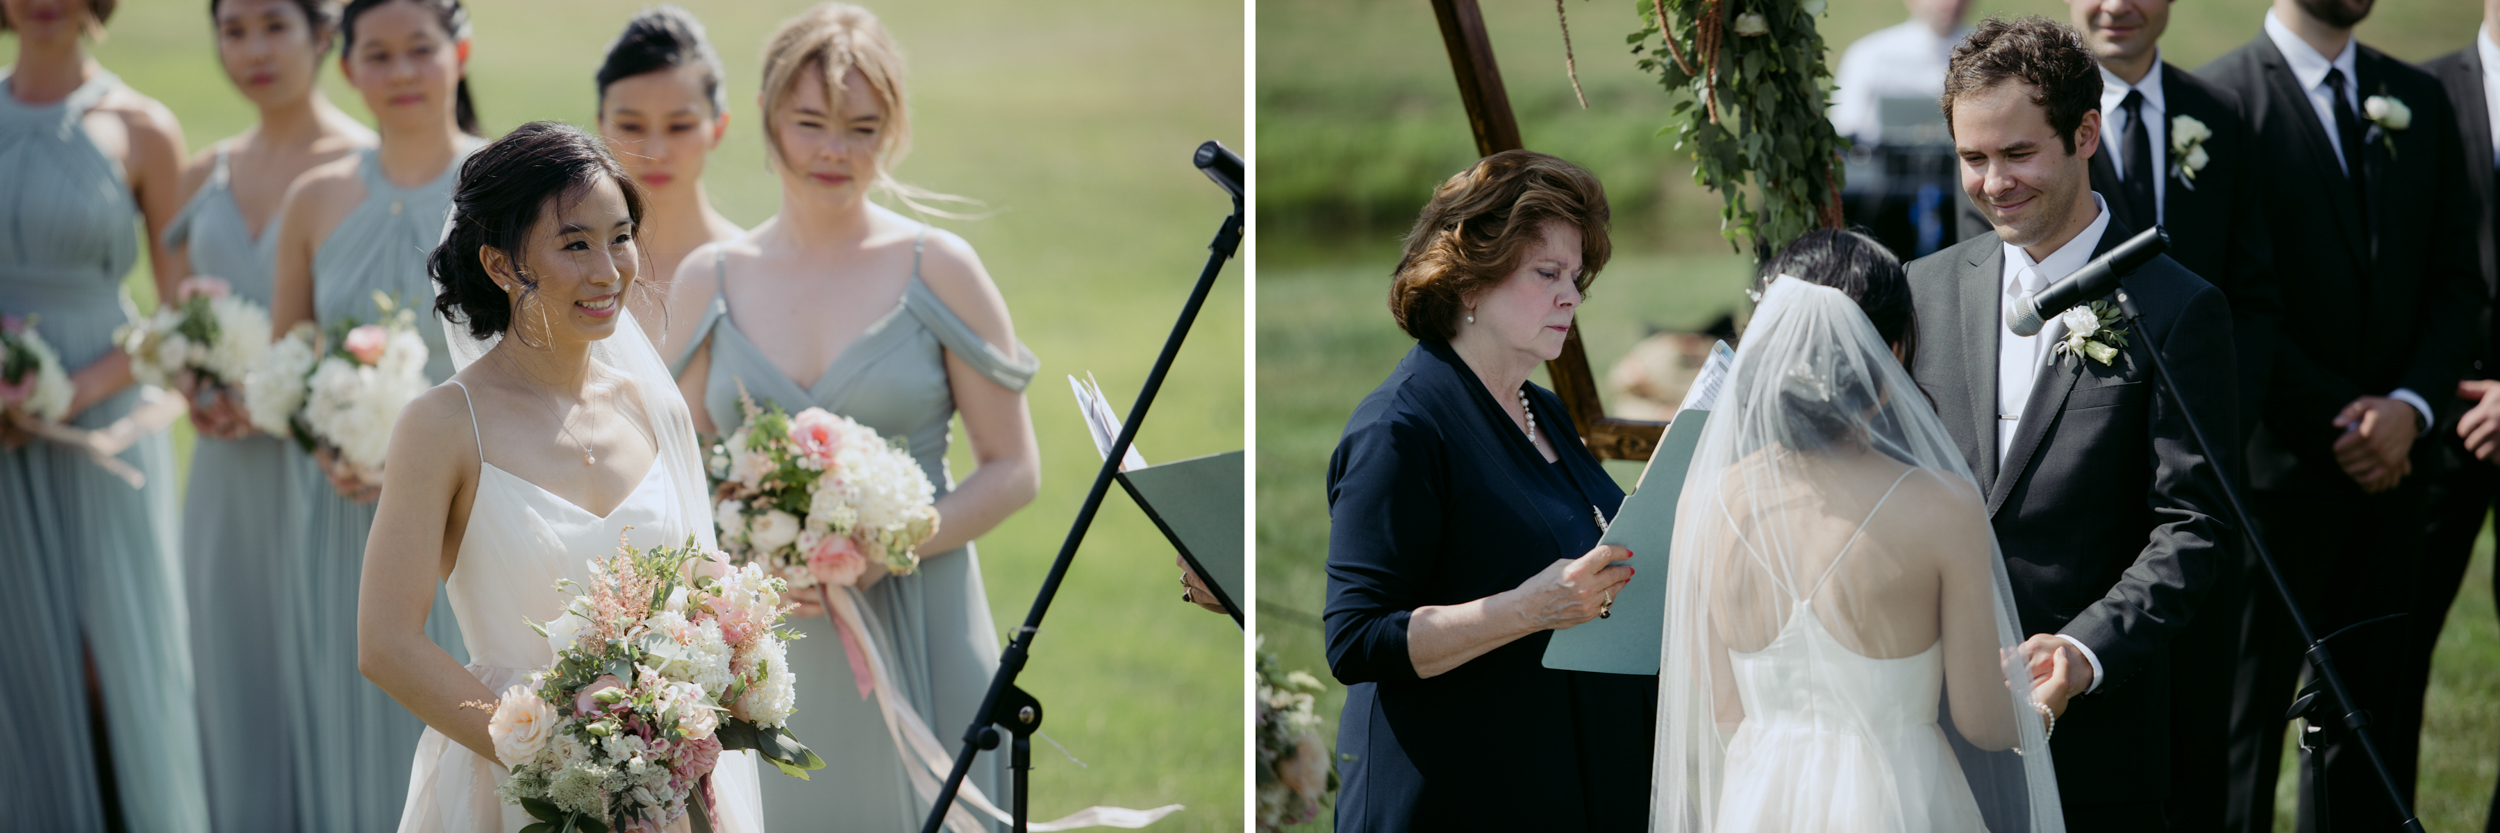 william_allen_farm_wedding_pownal_maine_ilkatayler-16.jpg